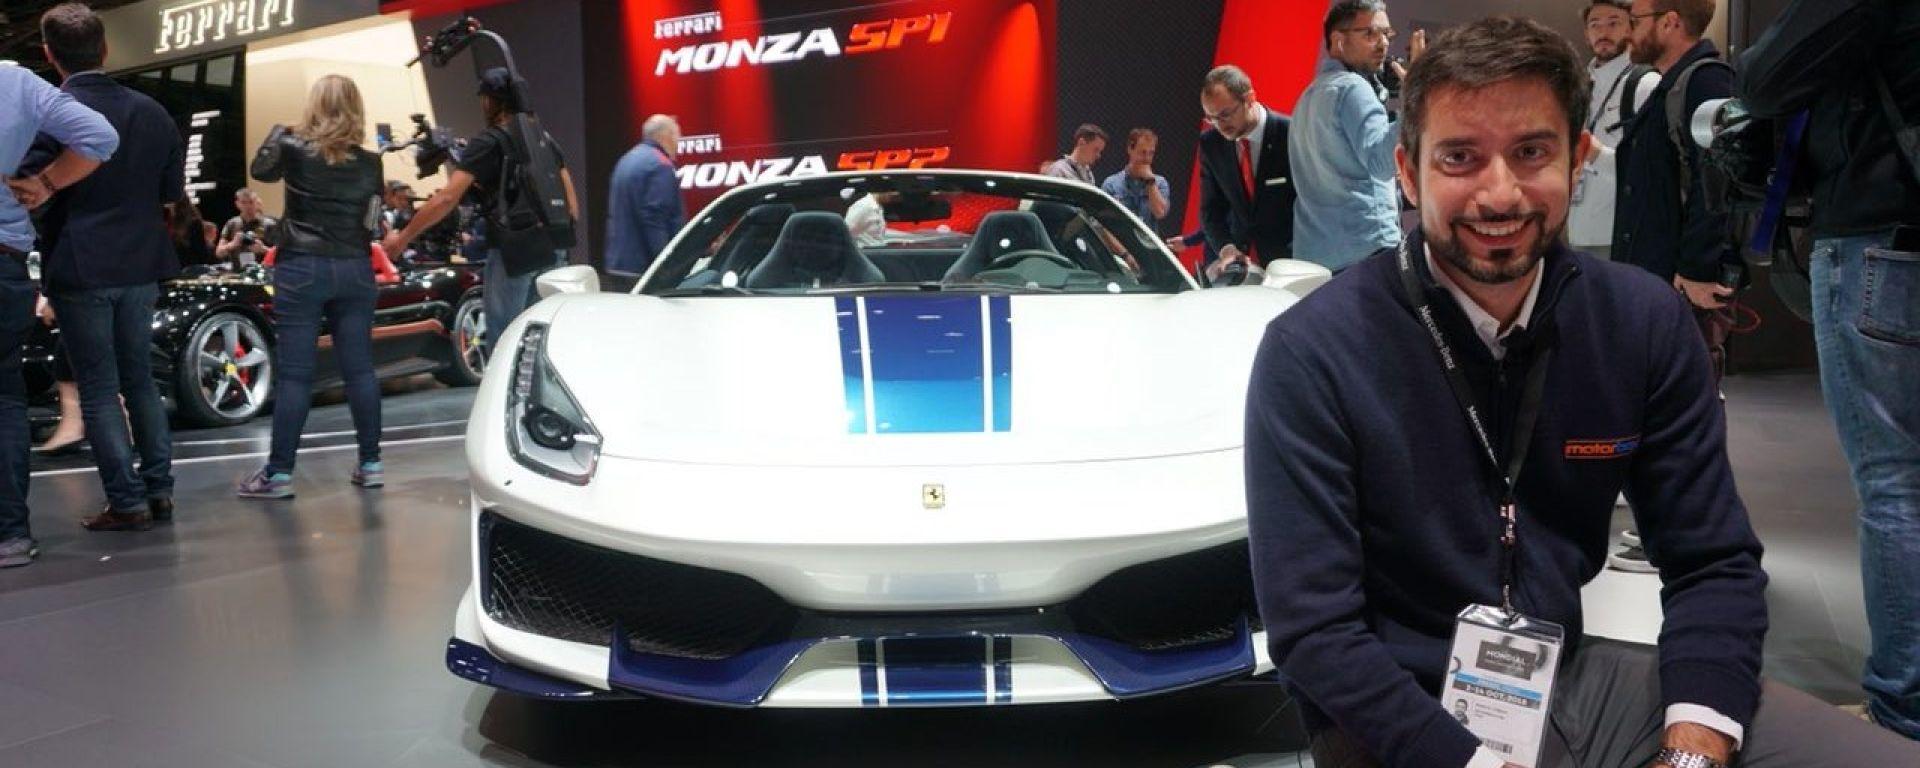 Ferrari 488 Pista Spider: la Serie Speciale in video da Parigi